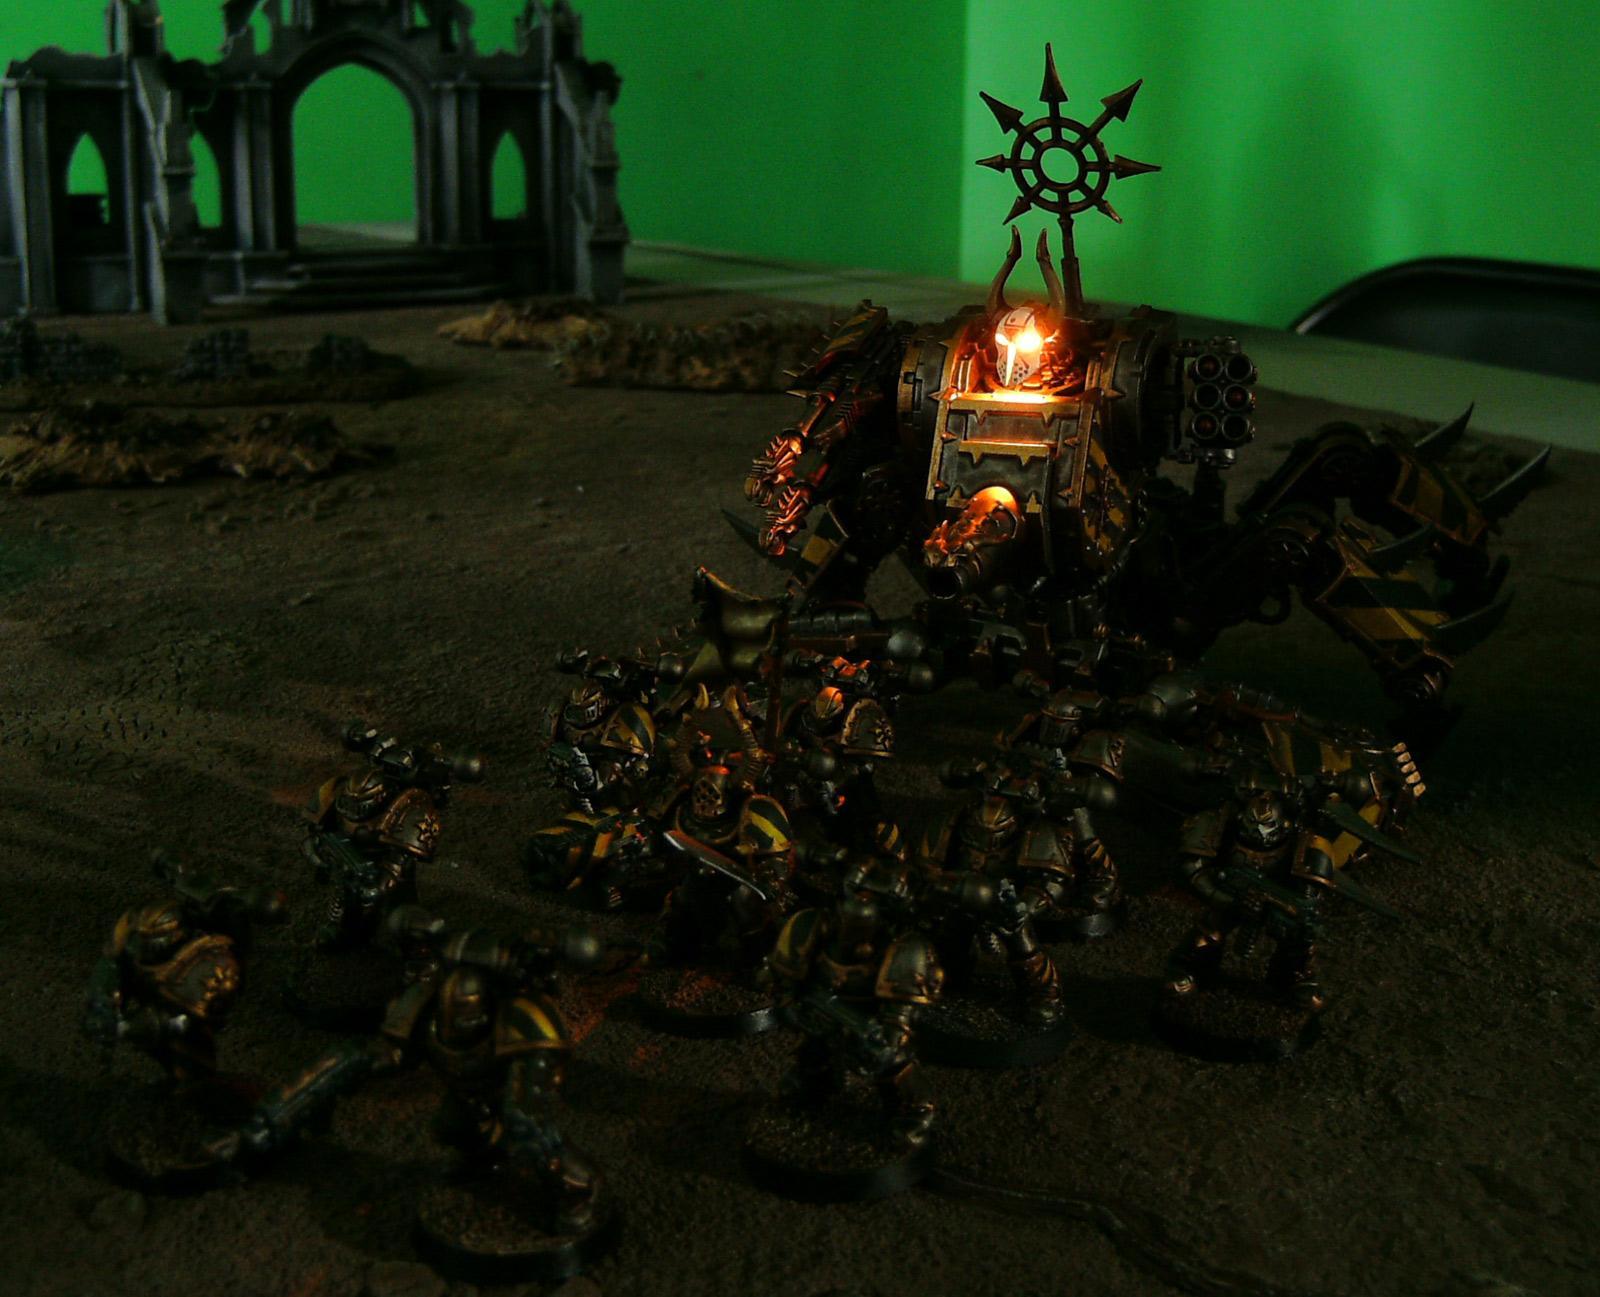 Chaos, Chaos Space Marines, Conversion, Defiler, Homebrew, Iron Marauders, LED, Lights, Ouze, Warhammer 40,000